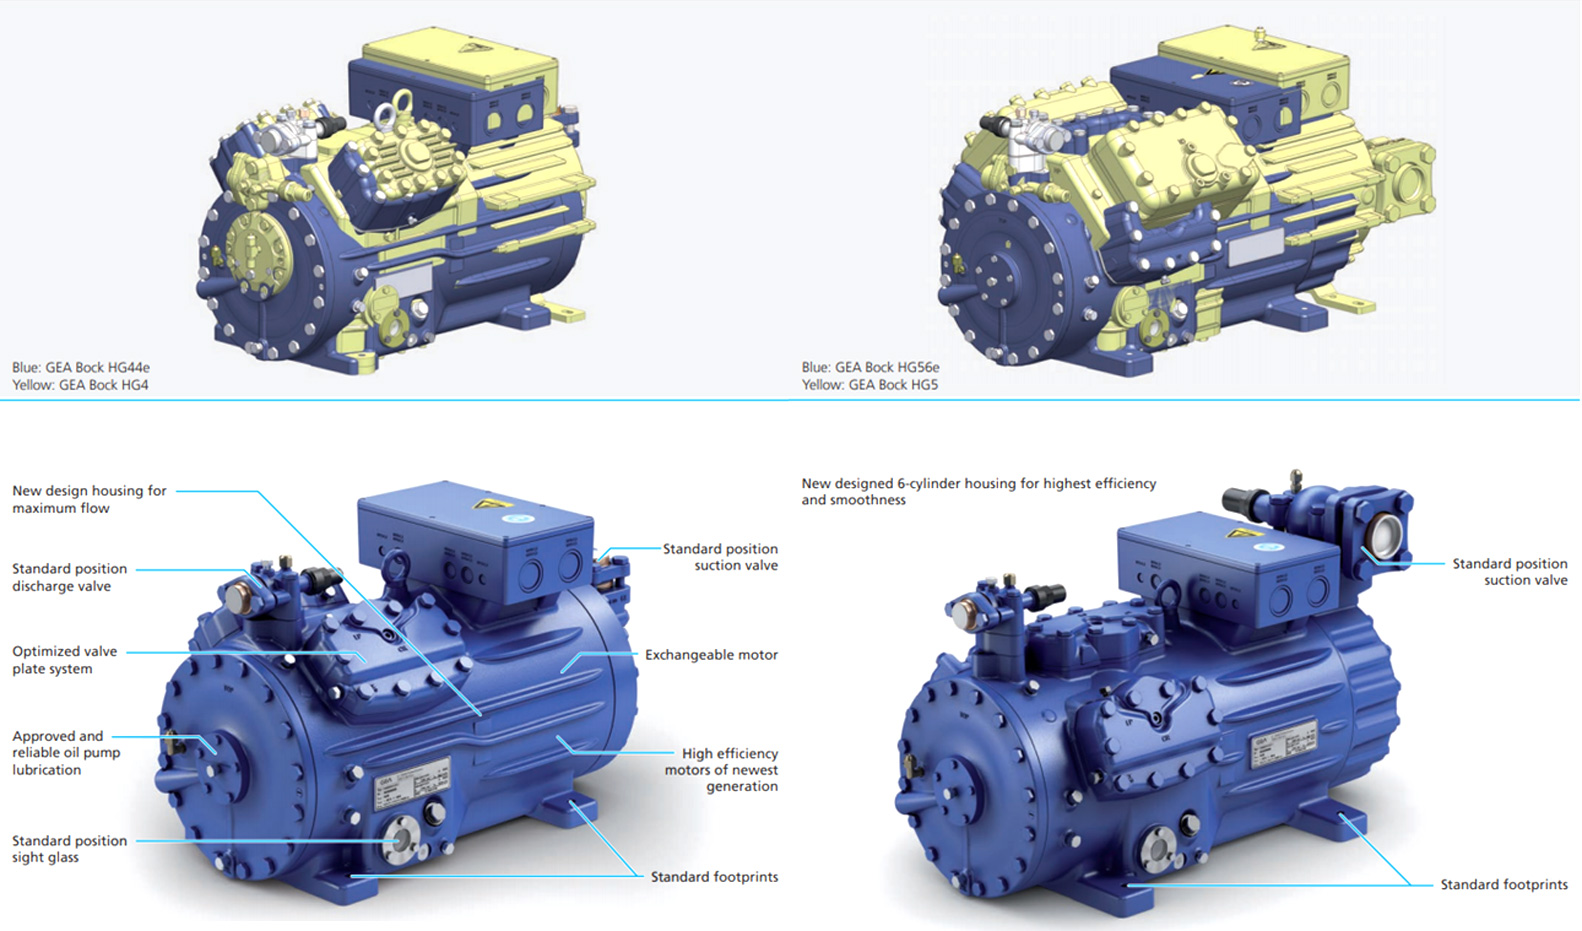 GEA Boke Compressor